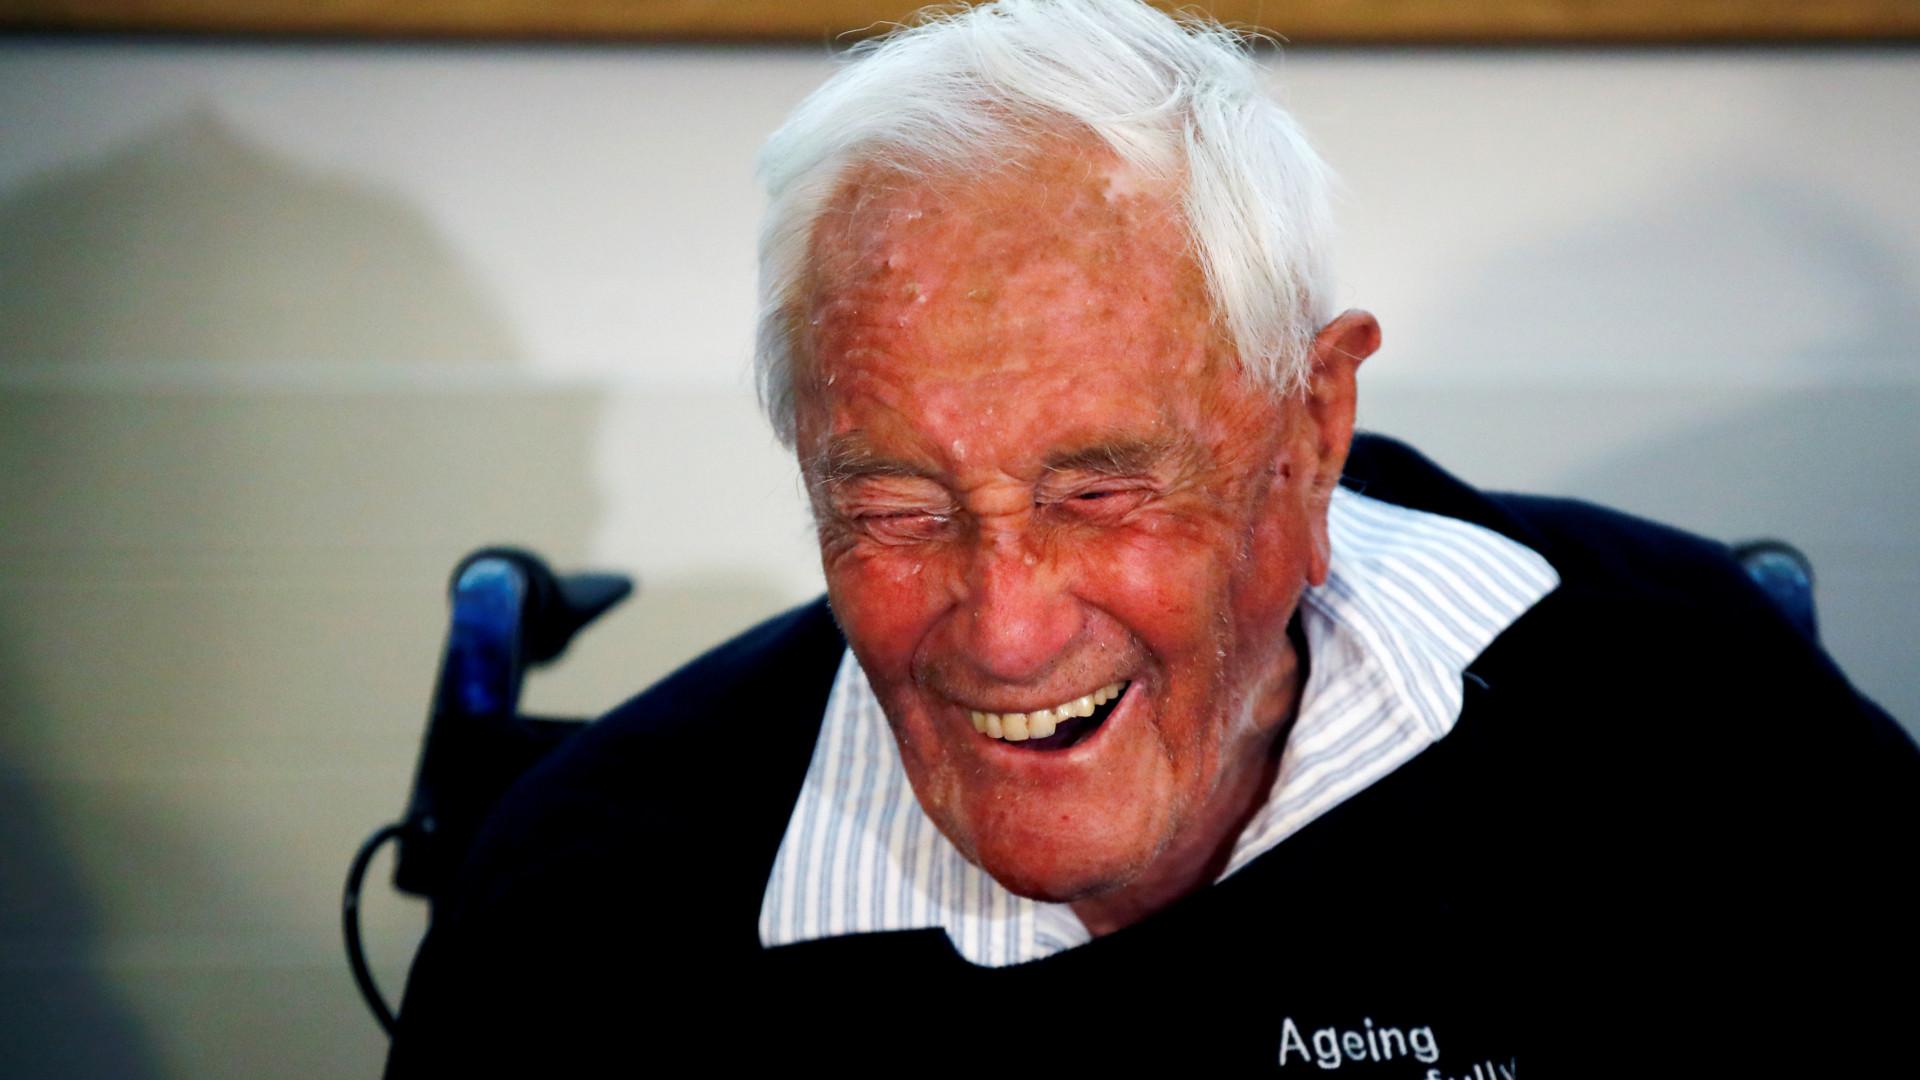 Famoso cientista australiano de 104 anos decidiu partir ao som de Beethoven